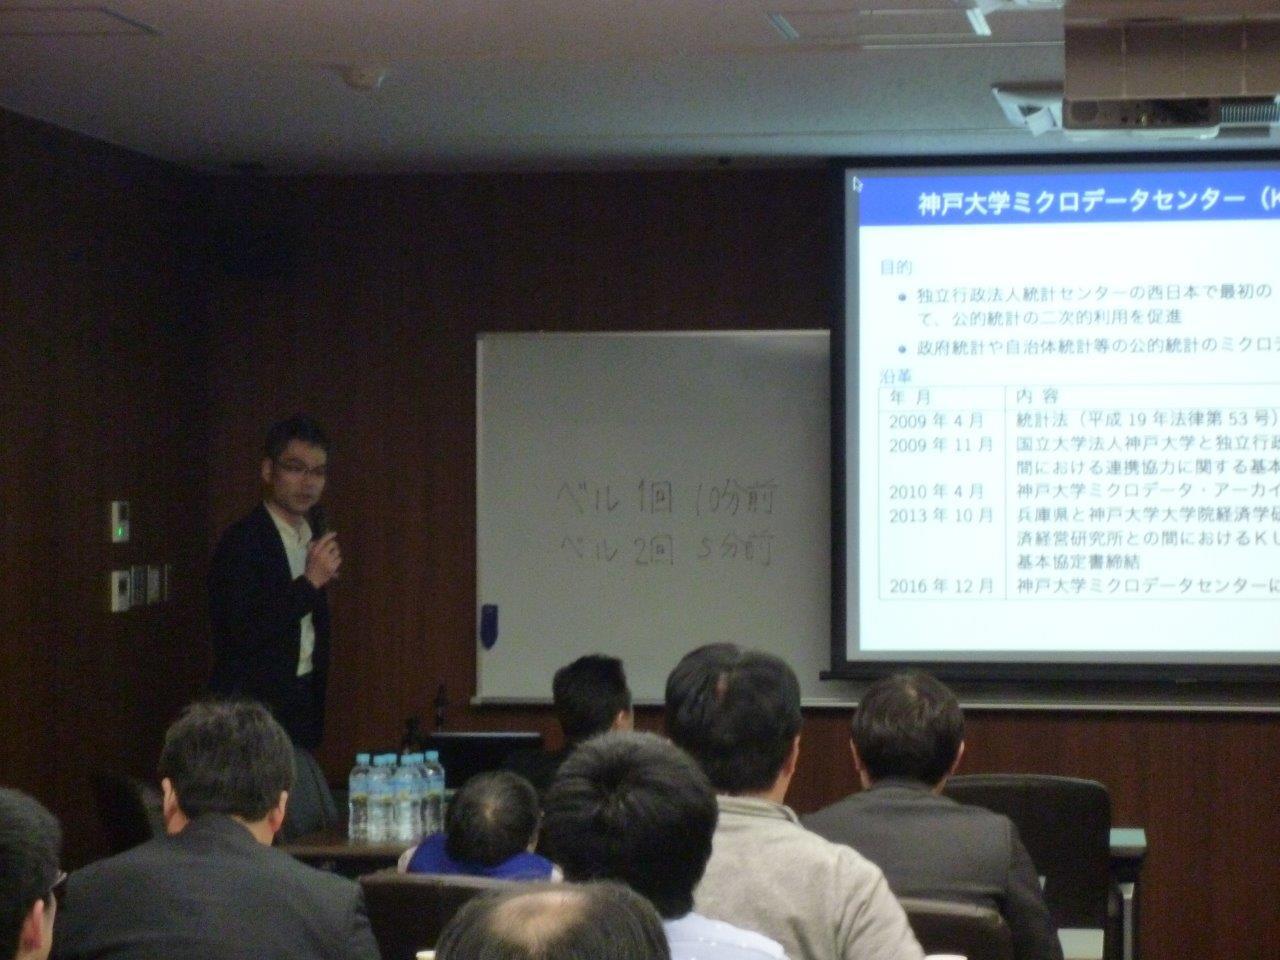 http://rcisss.ier.hit-u.ac.jp/Japanese/micro/information/P1040211.jpg